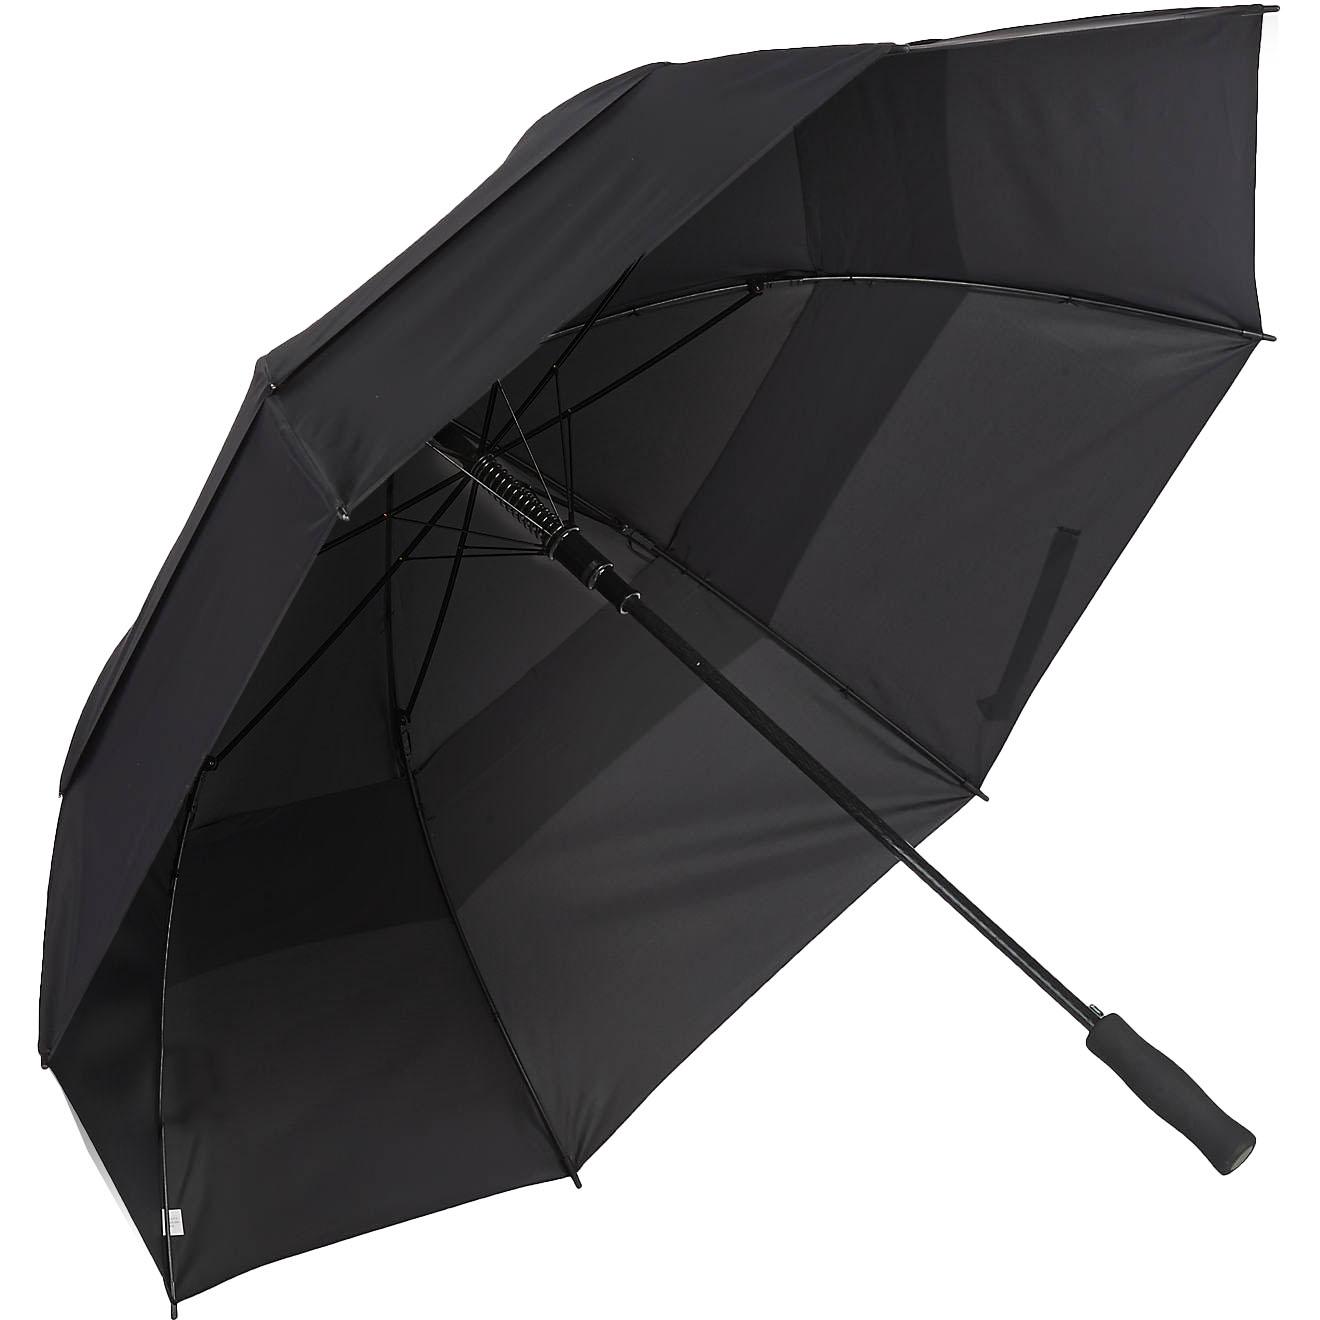 Totesport Automatic Open Golf Umbrella- Vented Canopy- 60-inch Arc